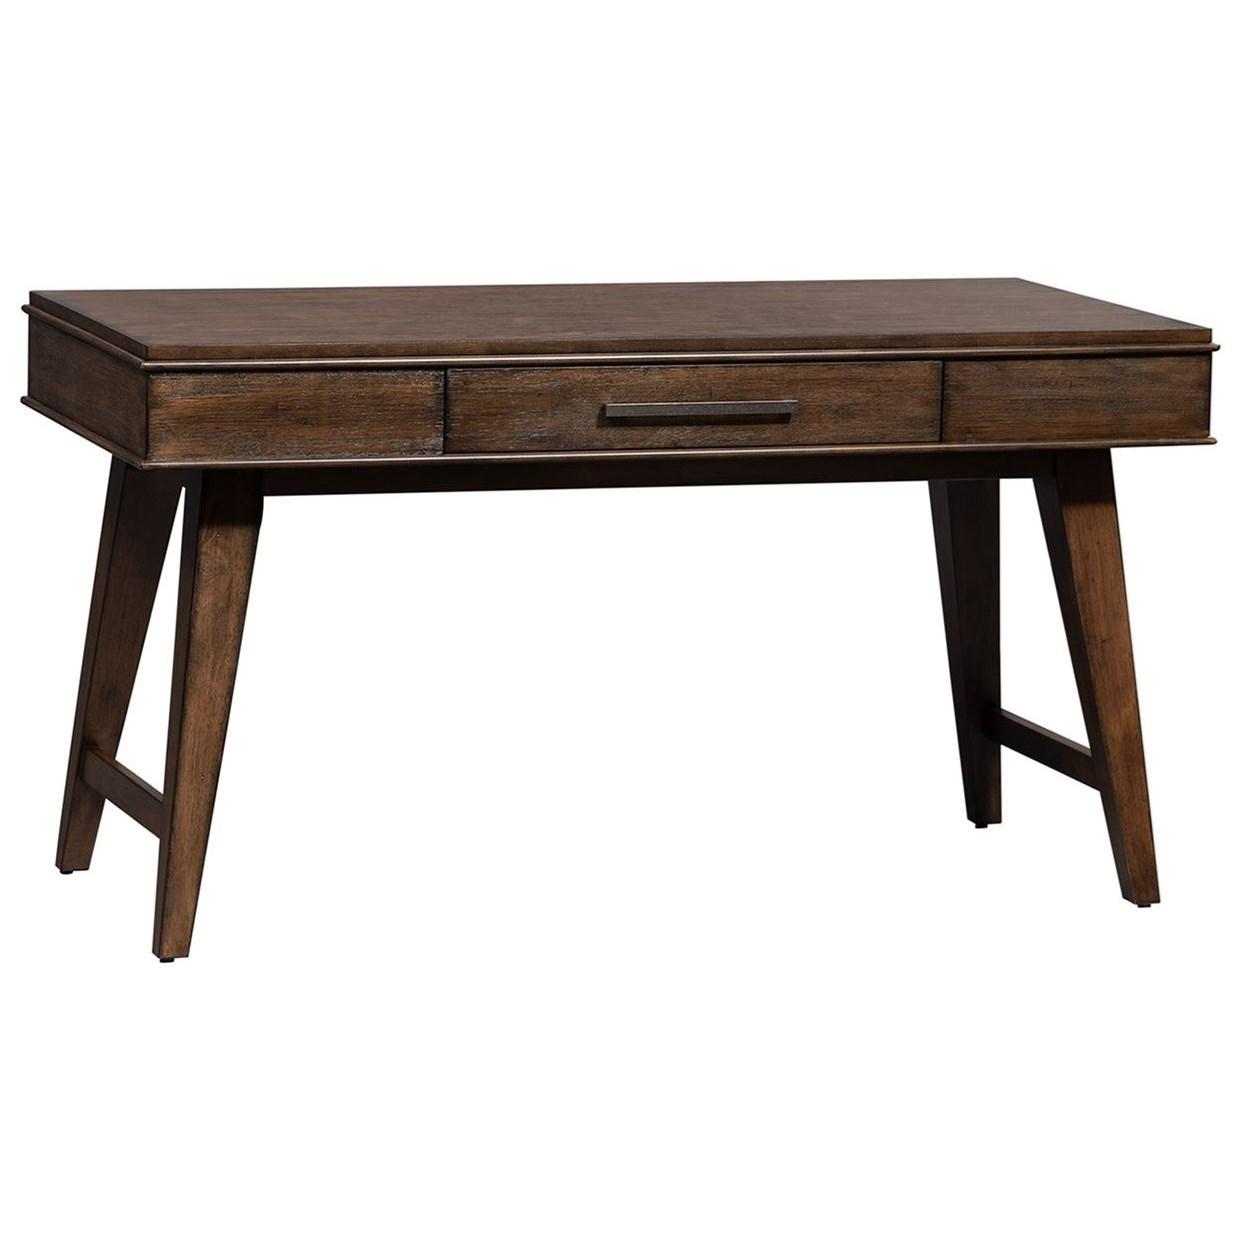 Ventura Boulevard Lift Top Writing Desk by Liberty Furniture at Northeast Factory Direct